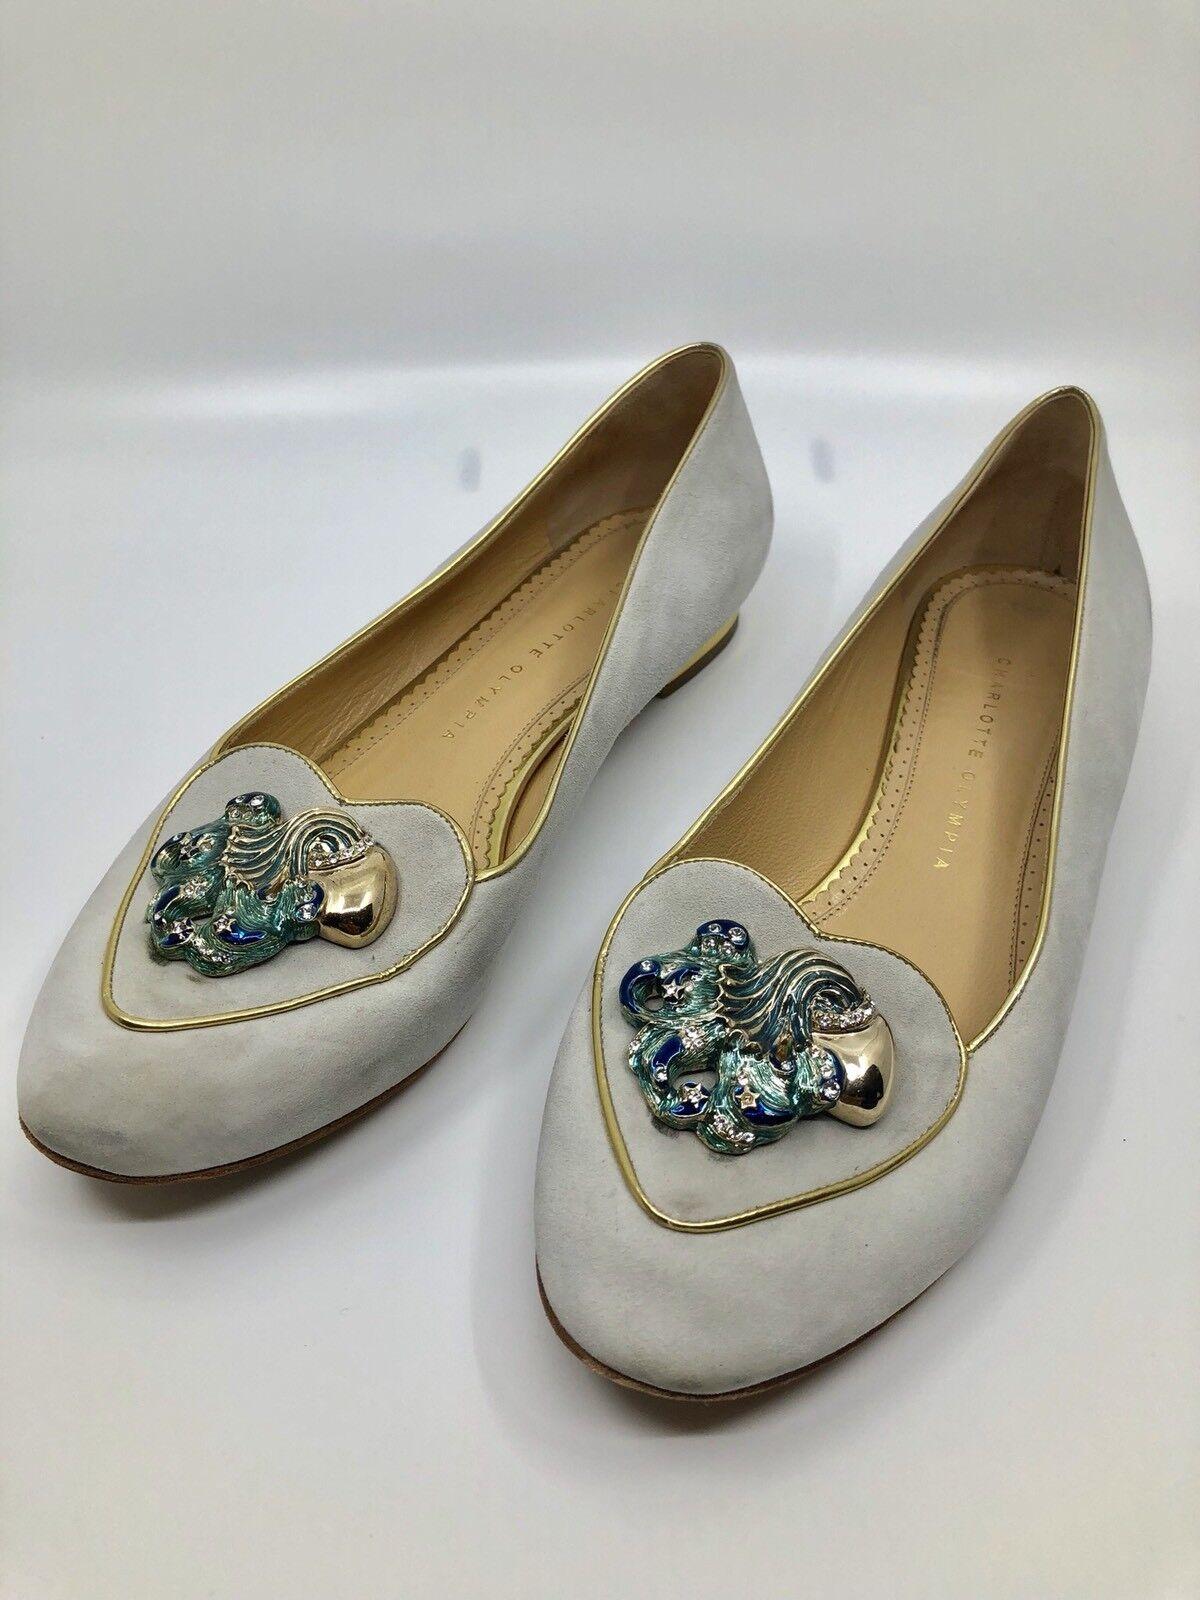 Charlotte Olympia Aquarius in  Pelle Scamosciata 41 Pantofole Donna  in  052090